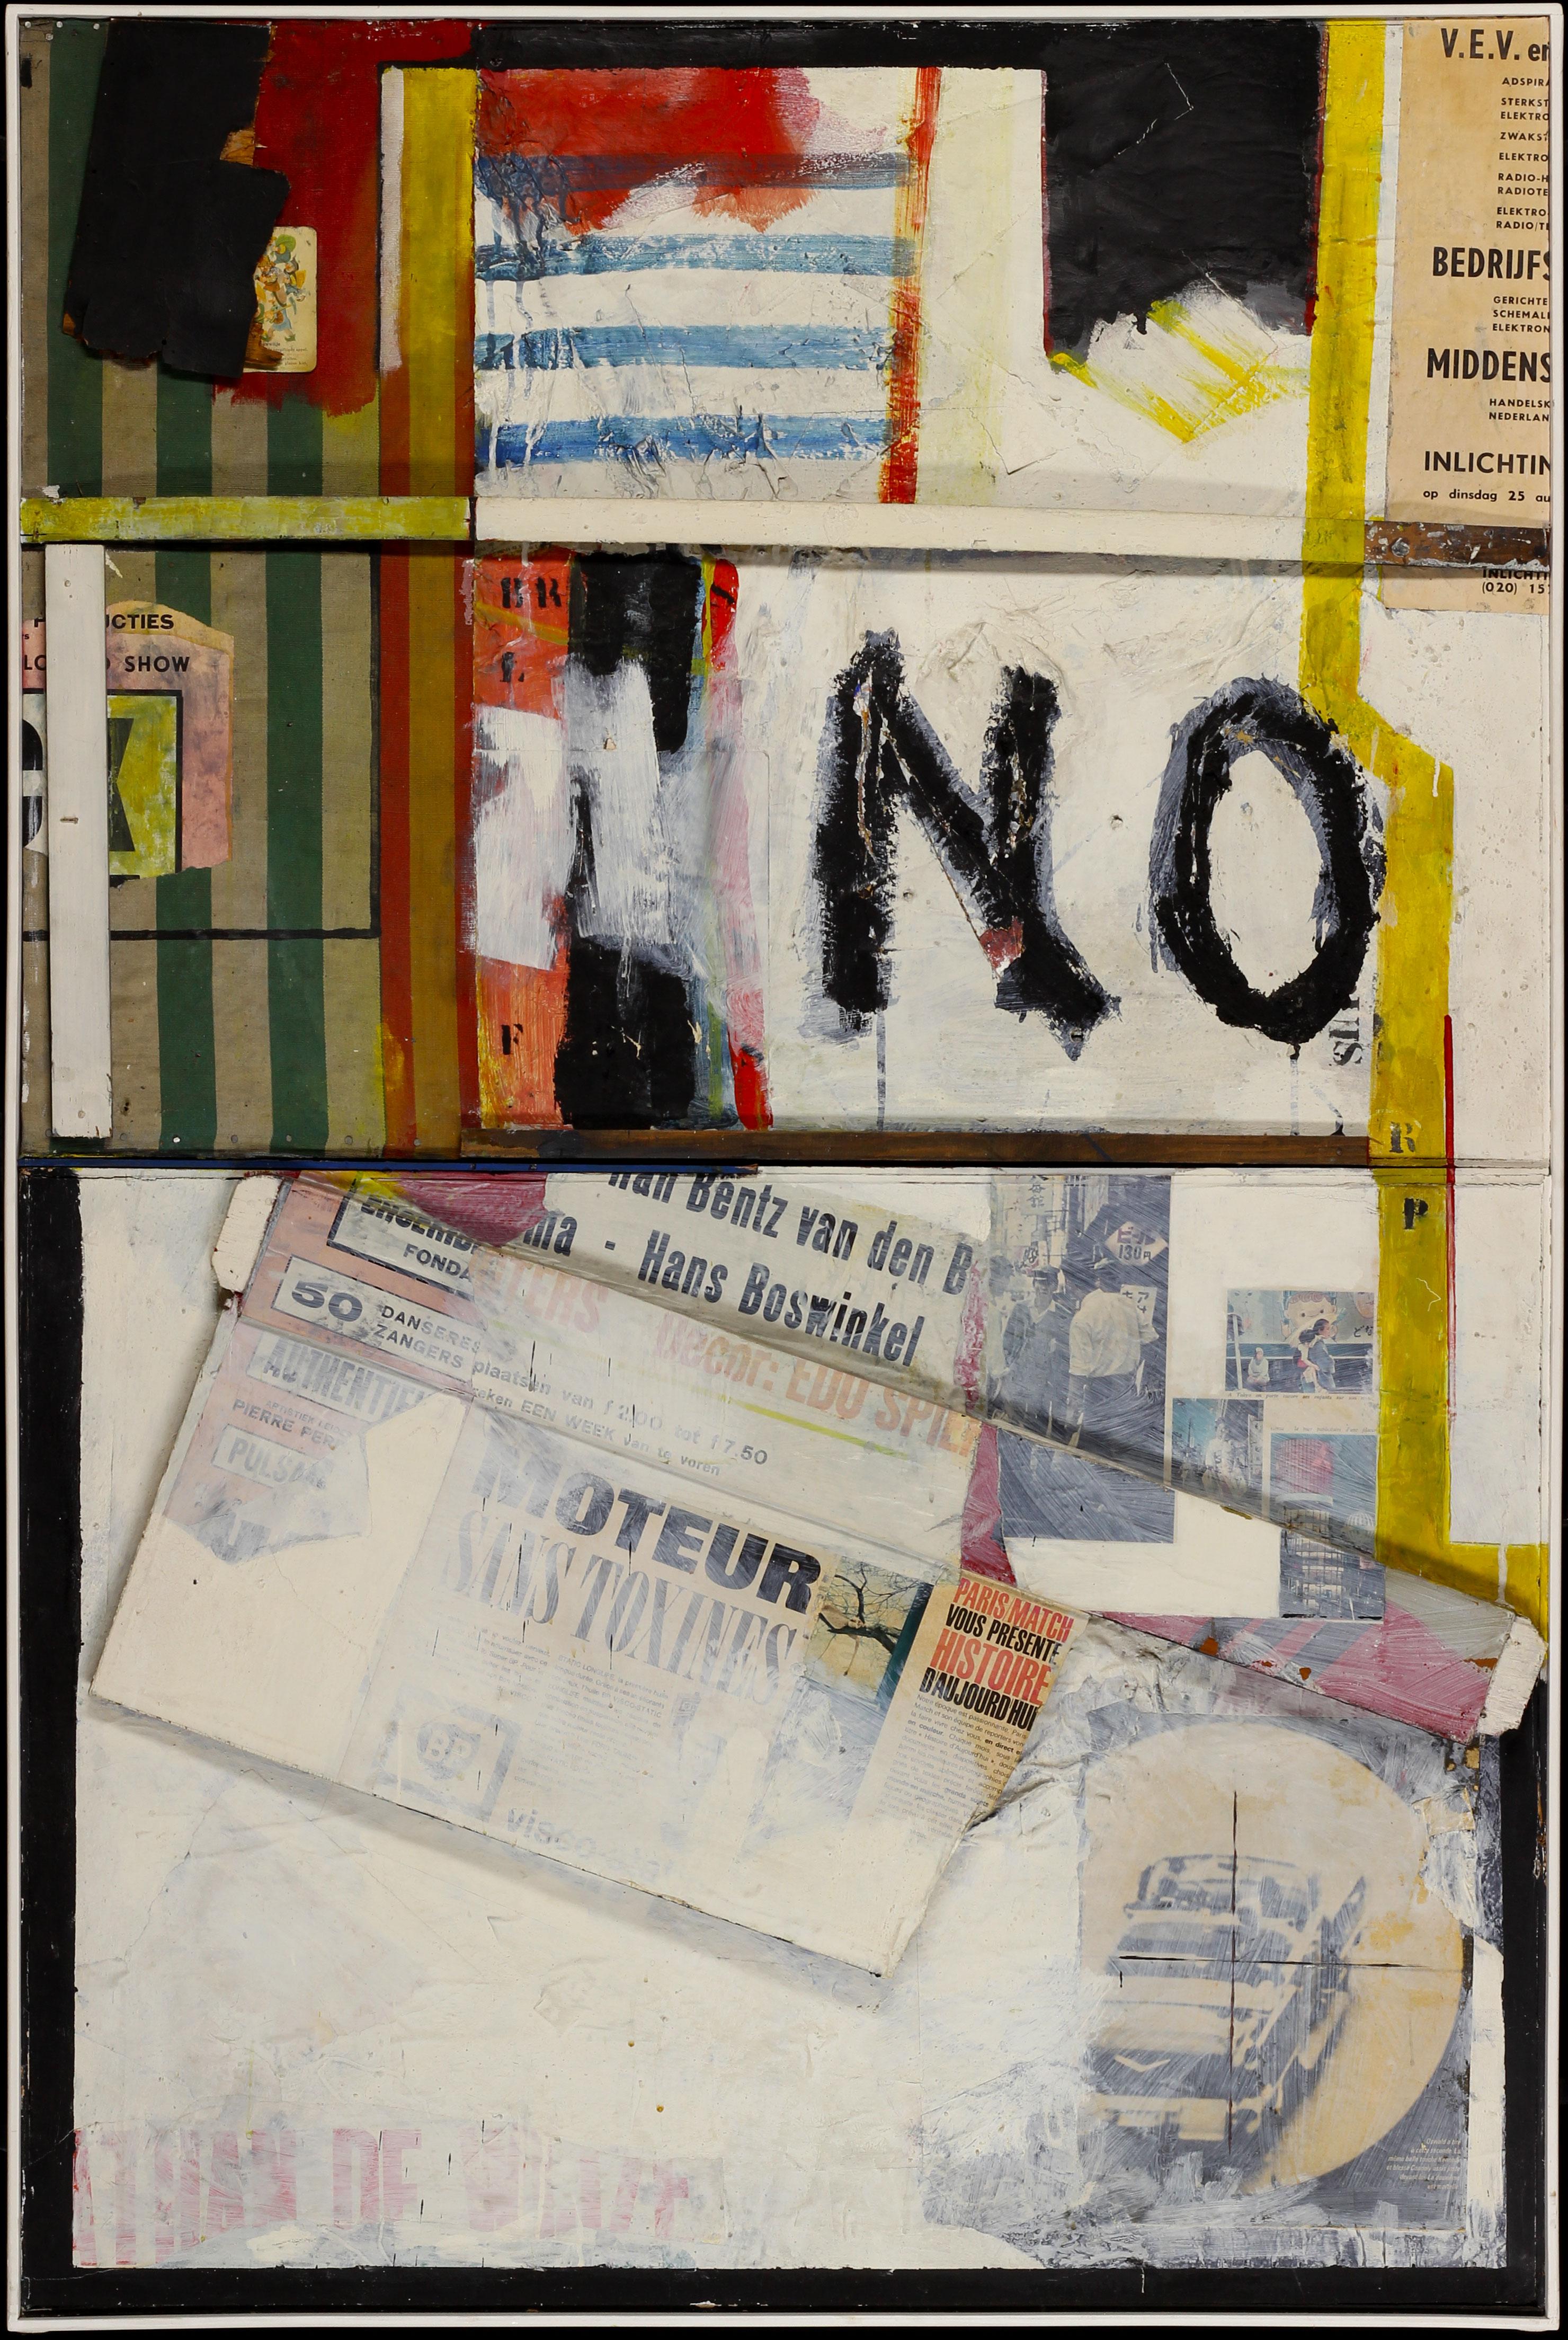 Schilderij/collage 'No' Gustave Asselbergs- Gustave Asselbergs